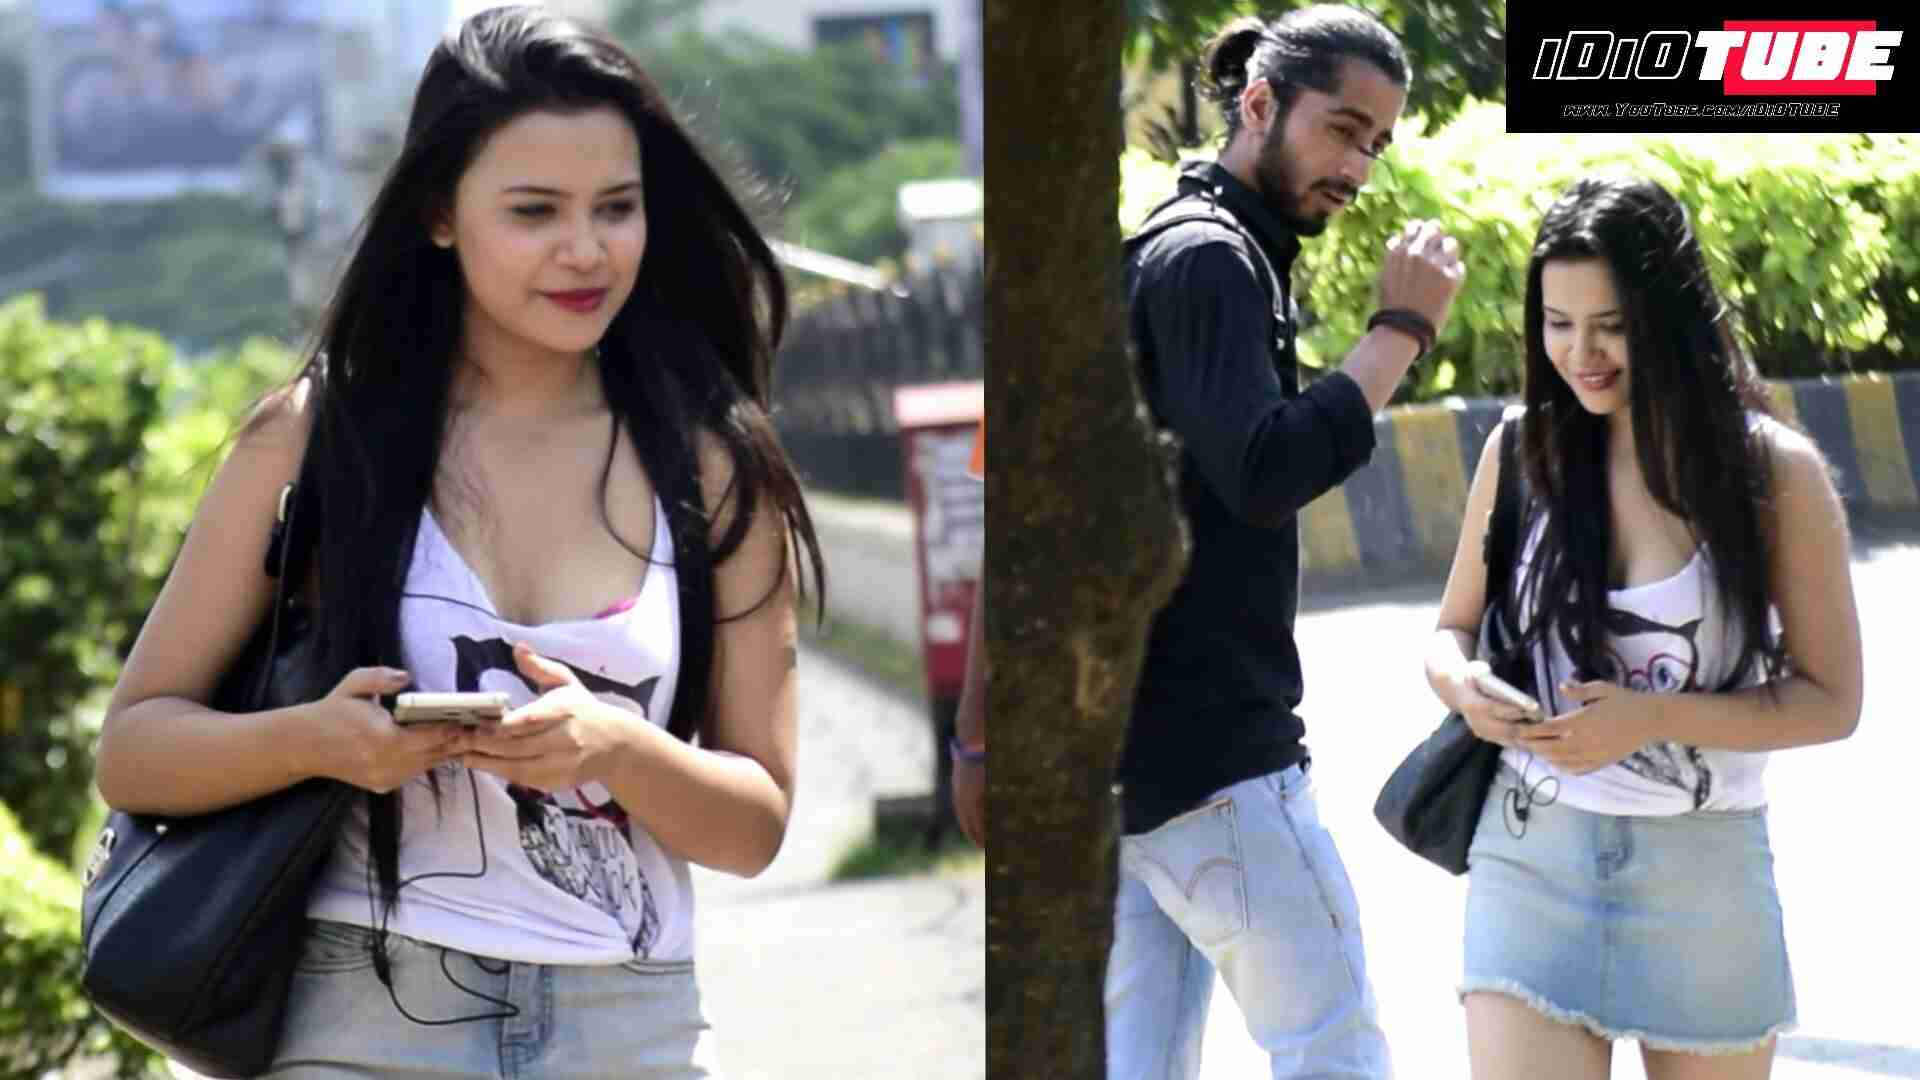 "Hot Girl Calling Boys ""BHAIYYAJI"" (Brother) Prank - iDiOTUBE   Pranks In India - YouTube"